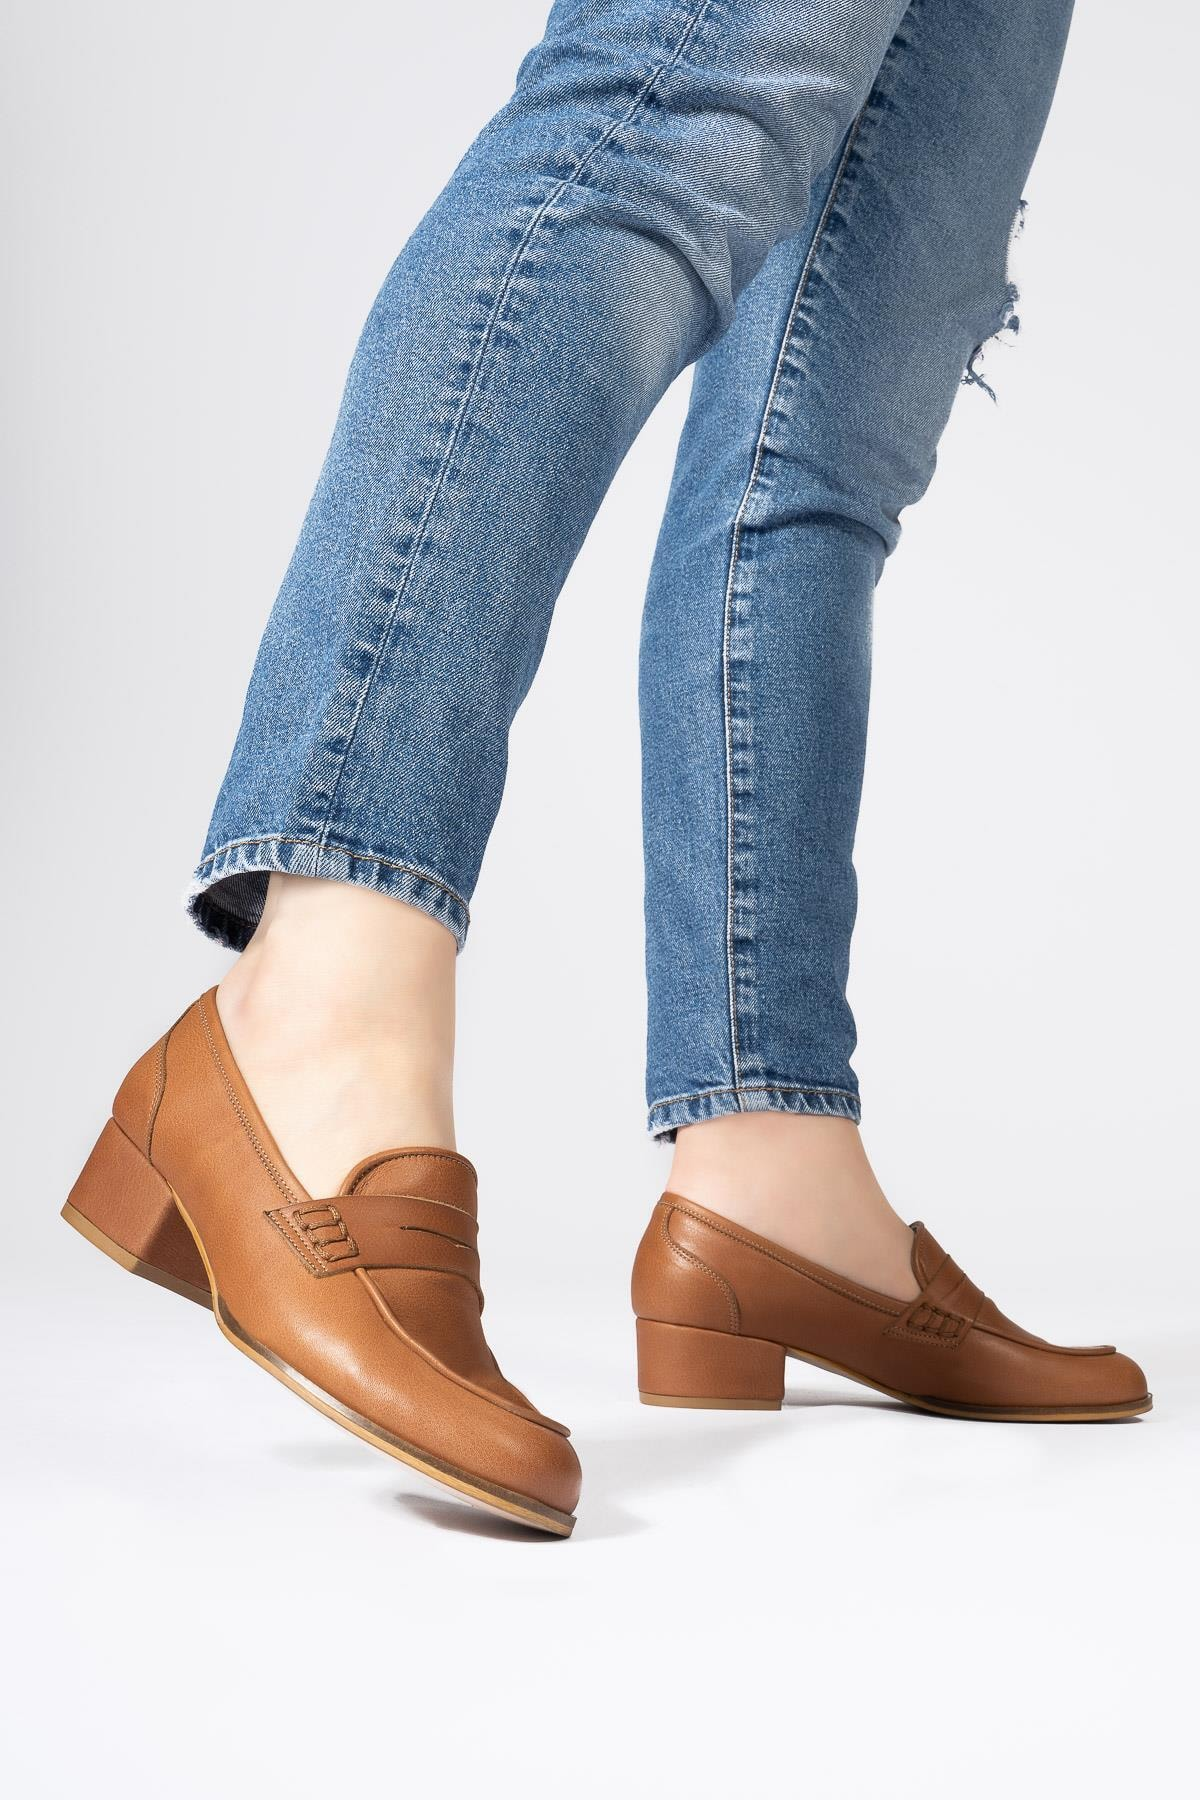 Hakiki Deri Topuklu Loafer Yuvarlak Burun Ayakkabı